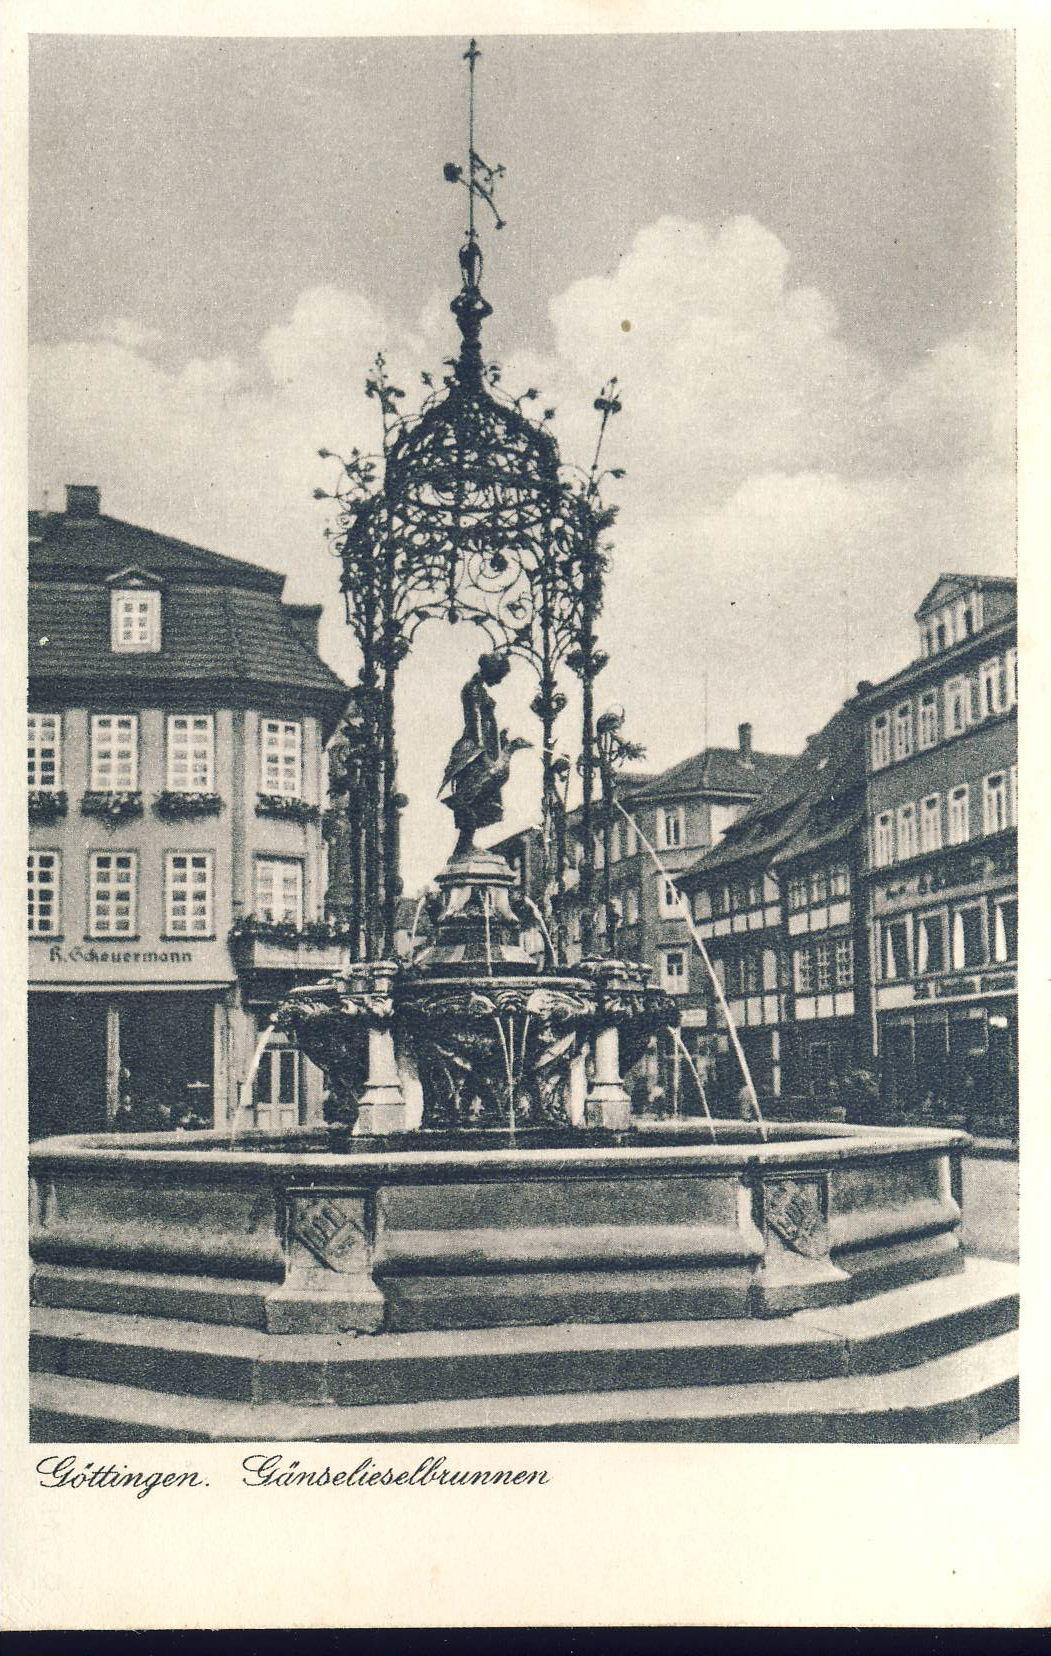 Göttingen Gänselieselbrunnen Old Postcard refP8 Pre-owned used condition.